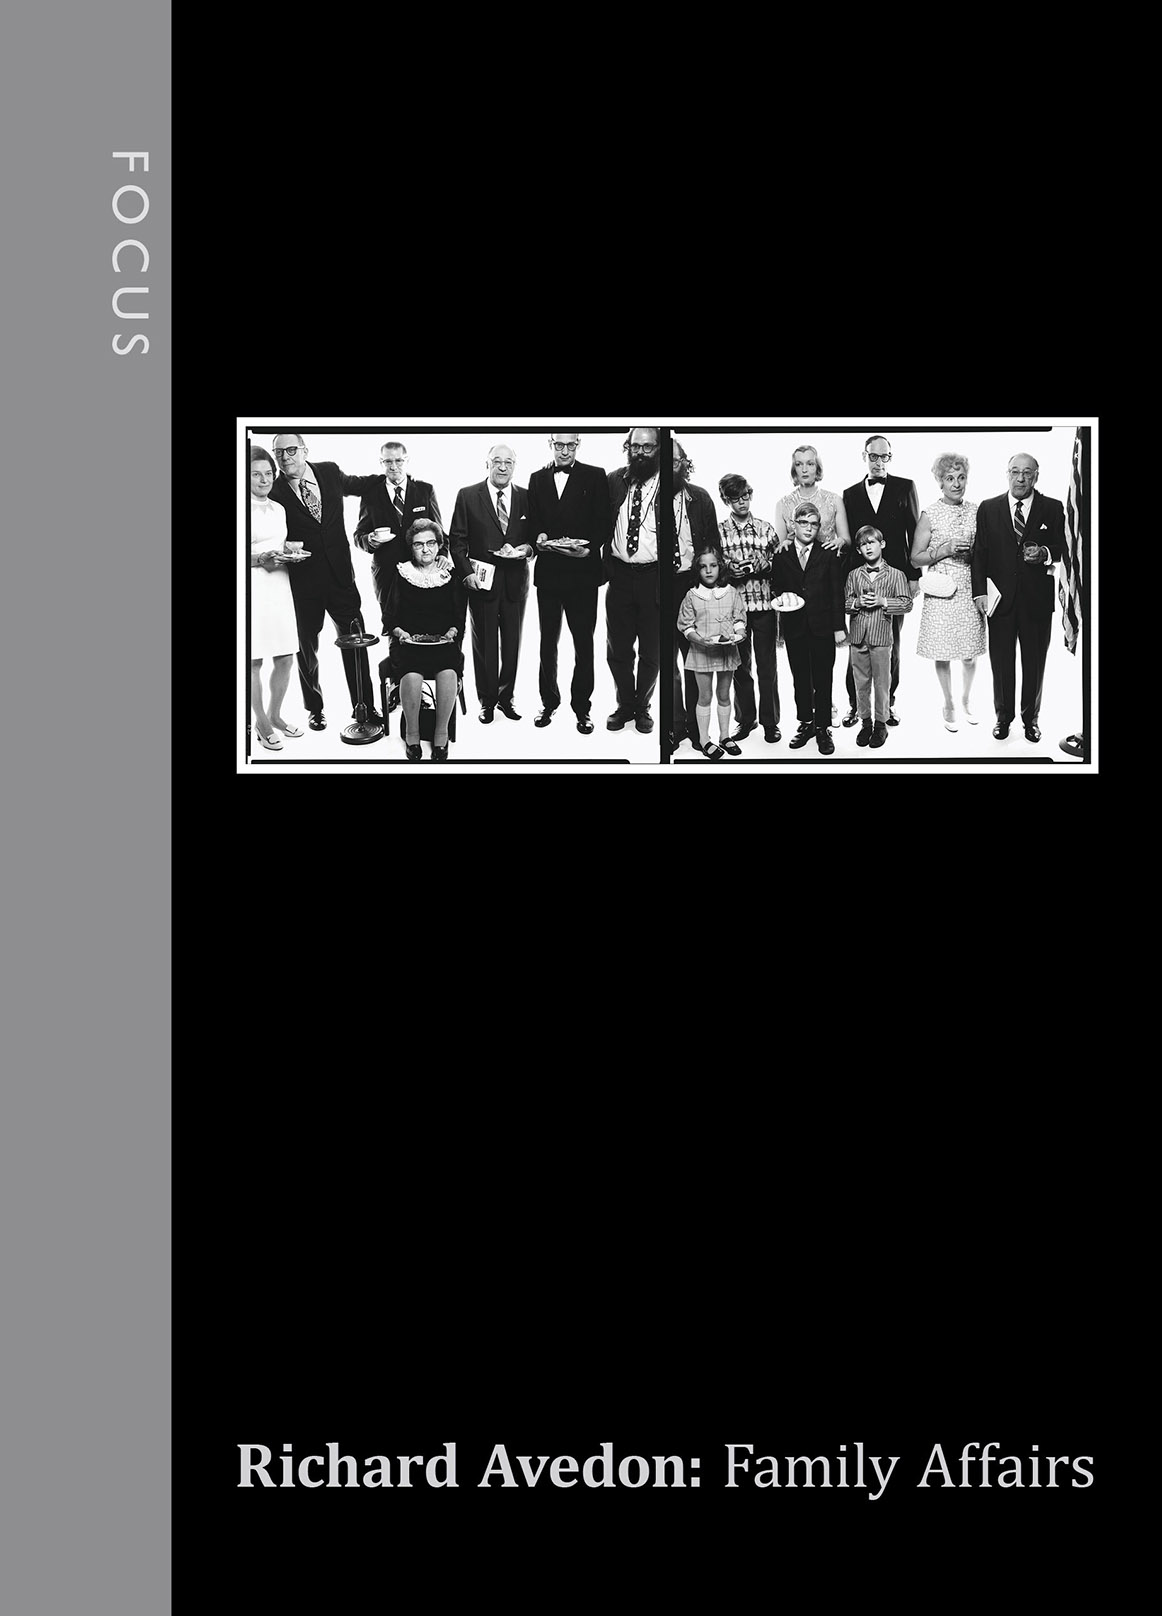 Richard Avedon: Family Affairs